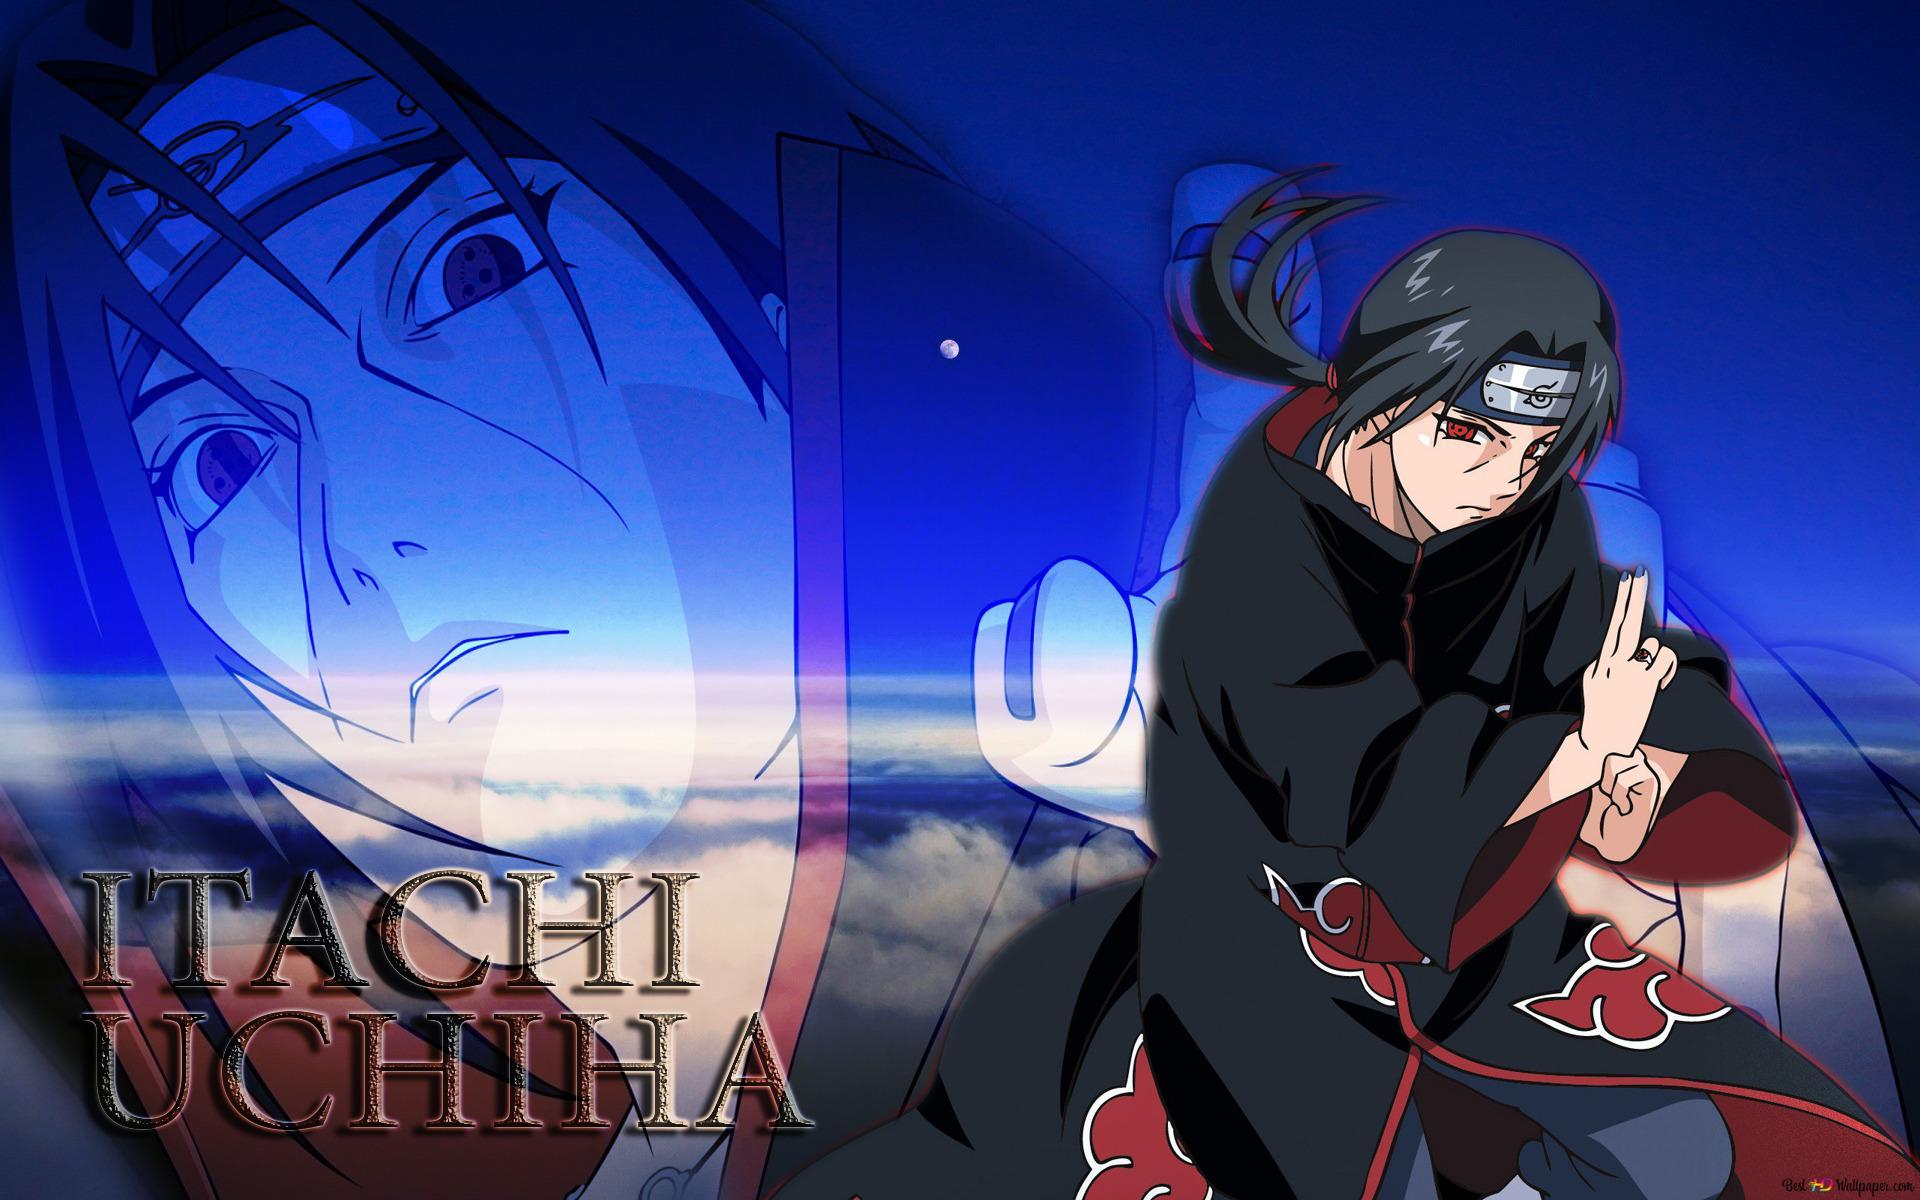 Naruto Shippuden Uchiha Itachi Hd Hintergrundbilder